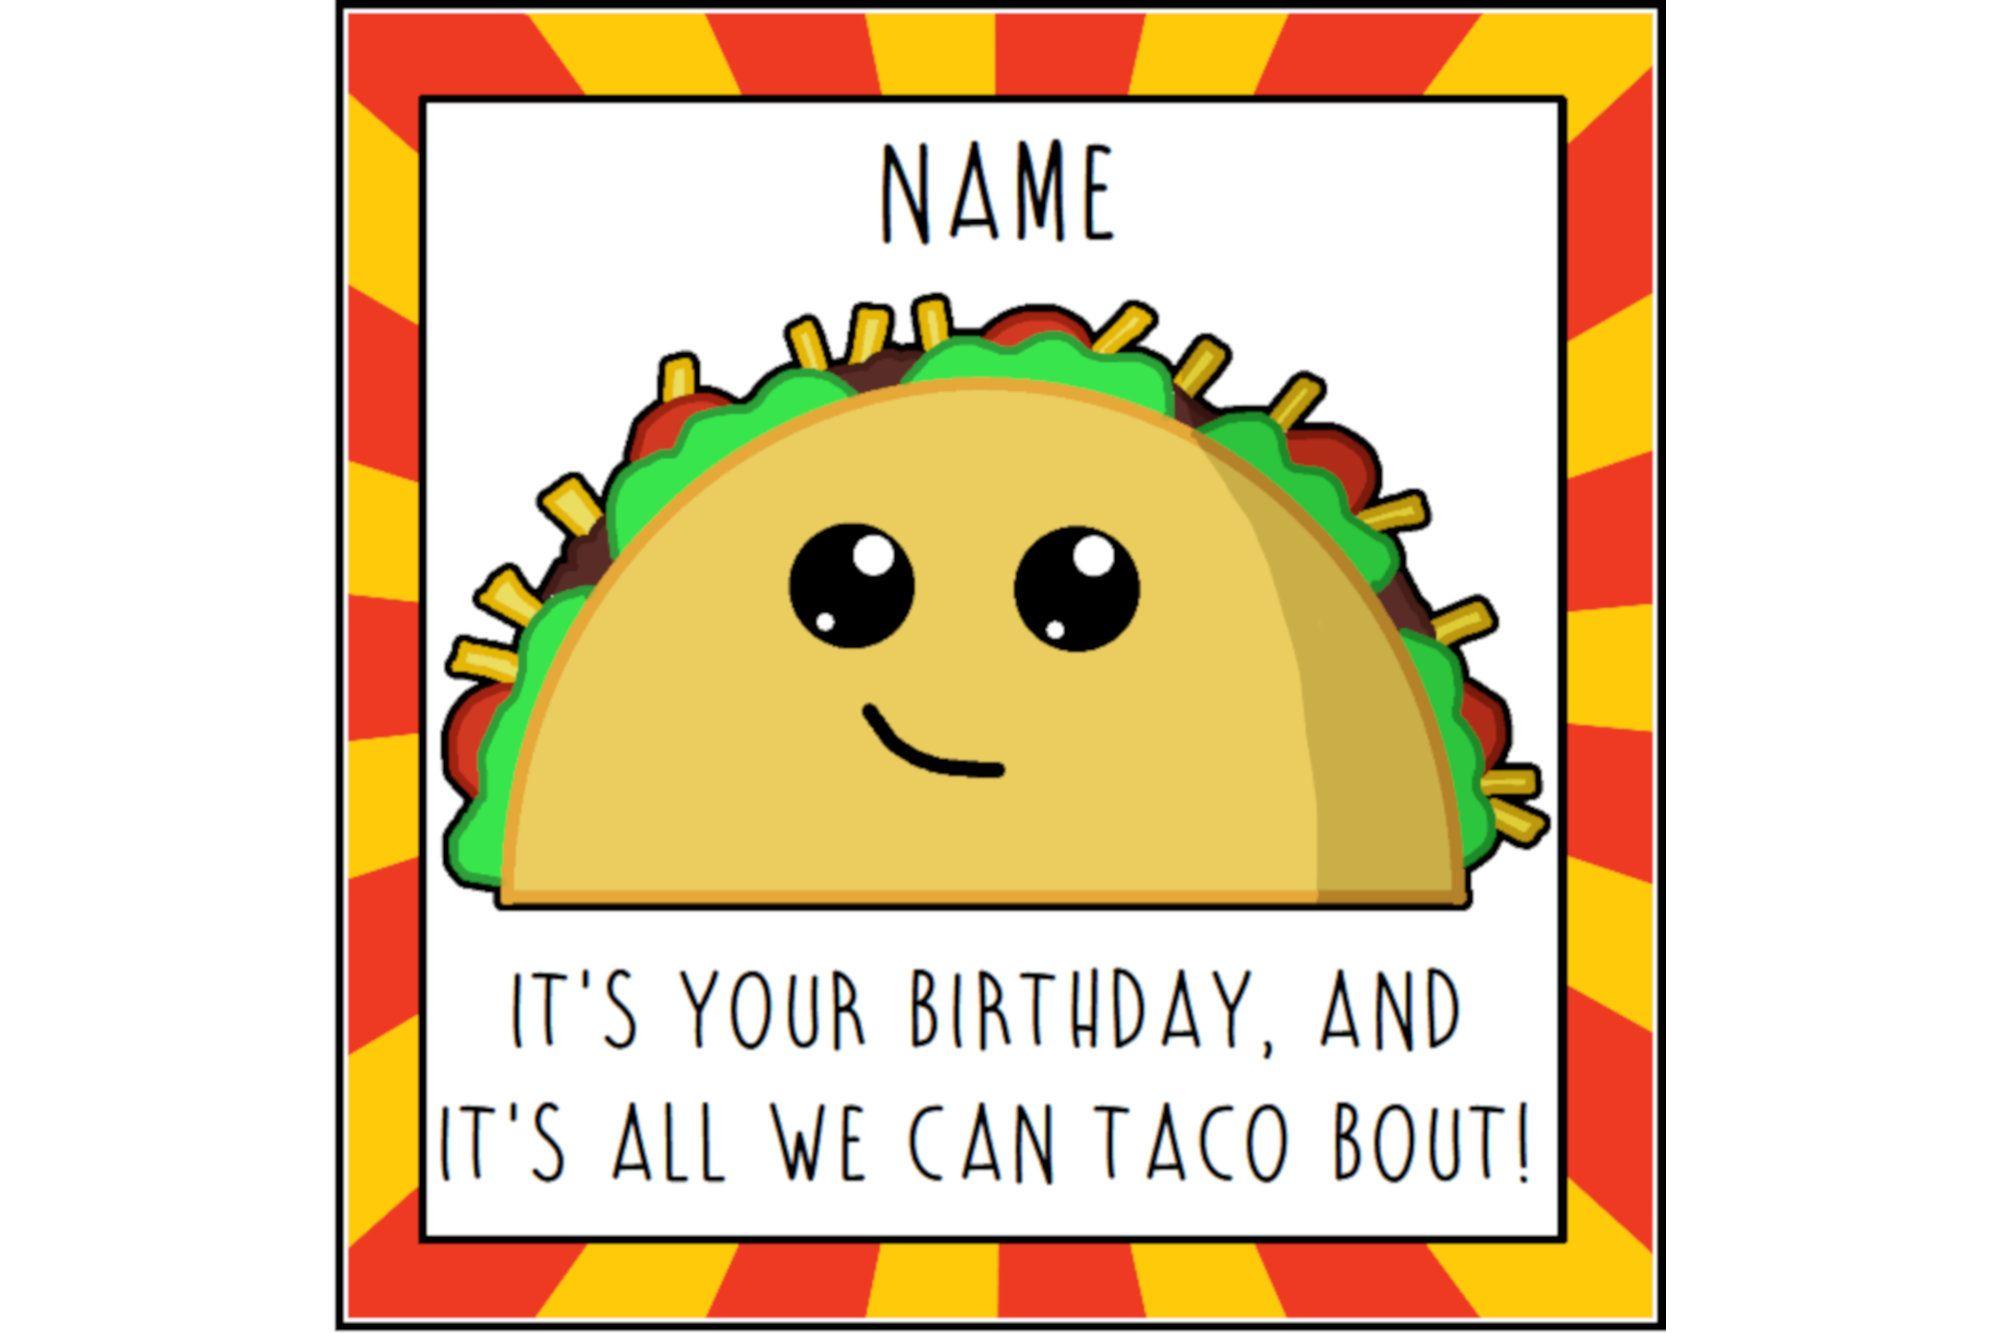 Taco Birthday Card Funny Card Birthday Greetings Food Lover Foodie Birthday Birthday Pun Food Pun Kawa Funny Birthday Cards Birthday Cards Birthday Puns